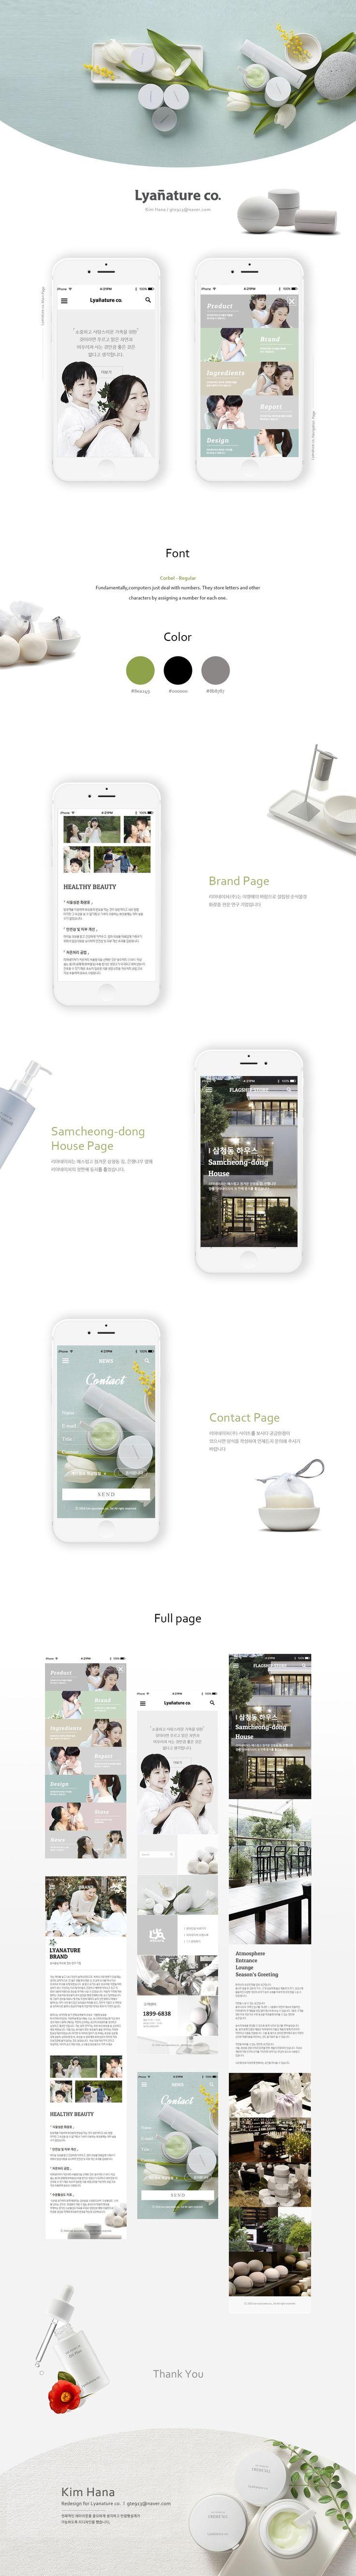 Lyanature mobile Redesign - Designer - Kim-hana on Behance